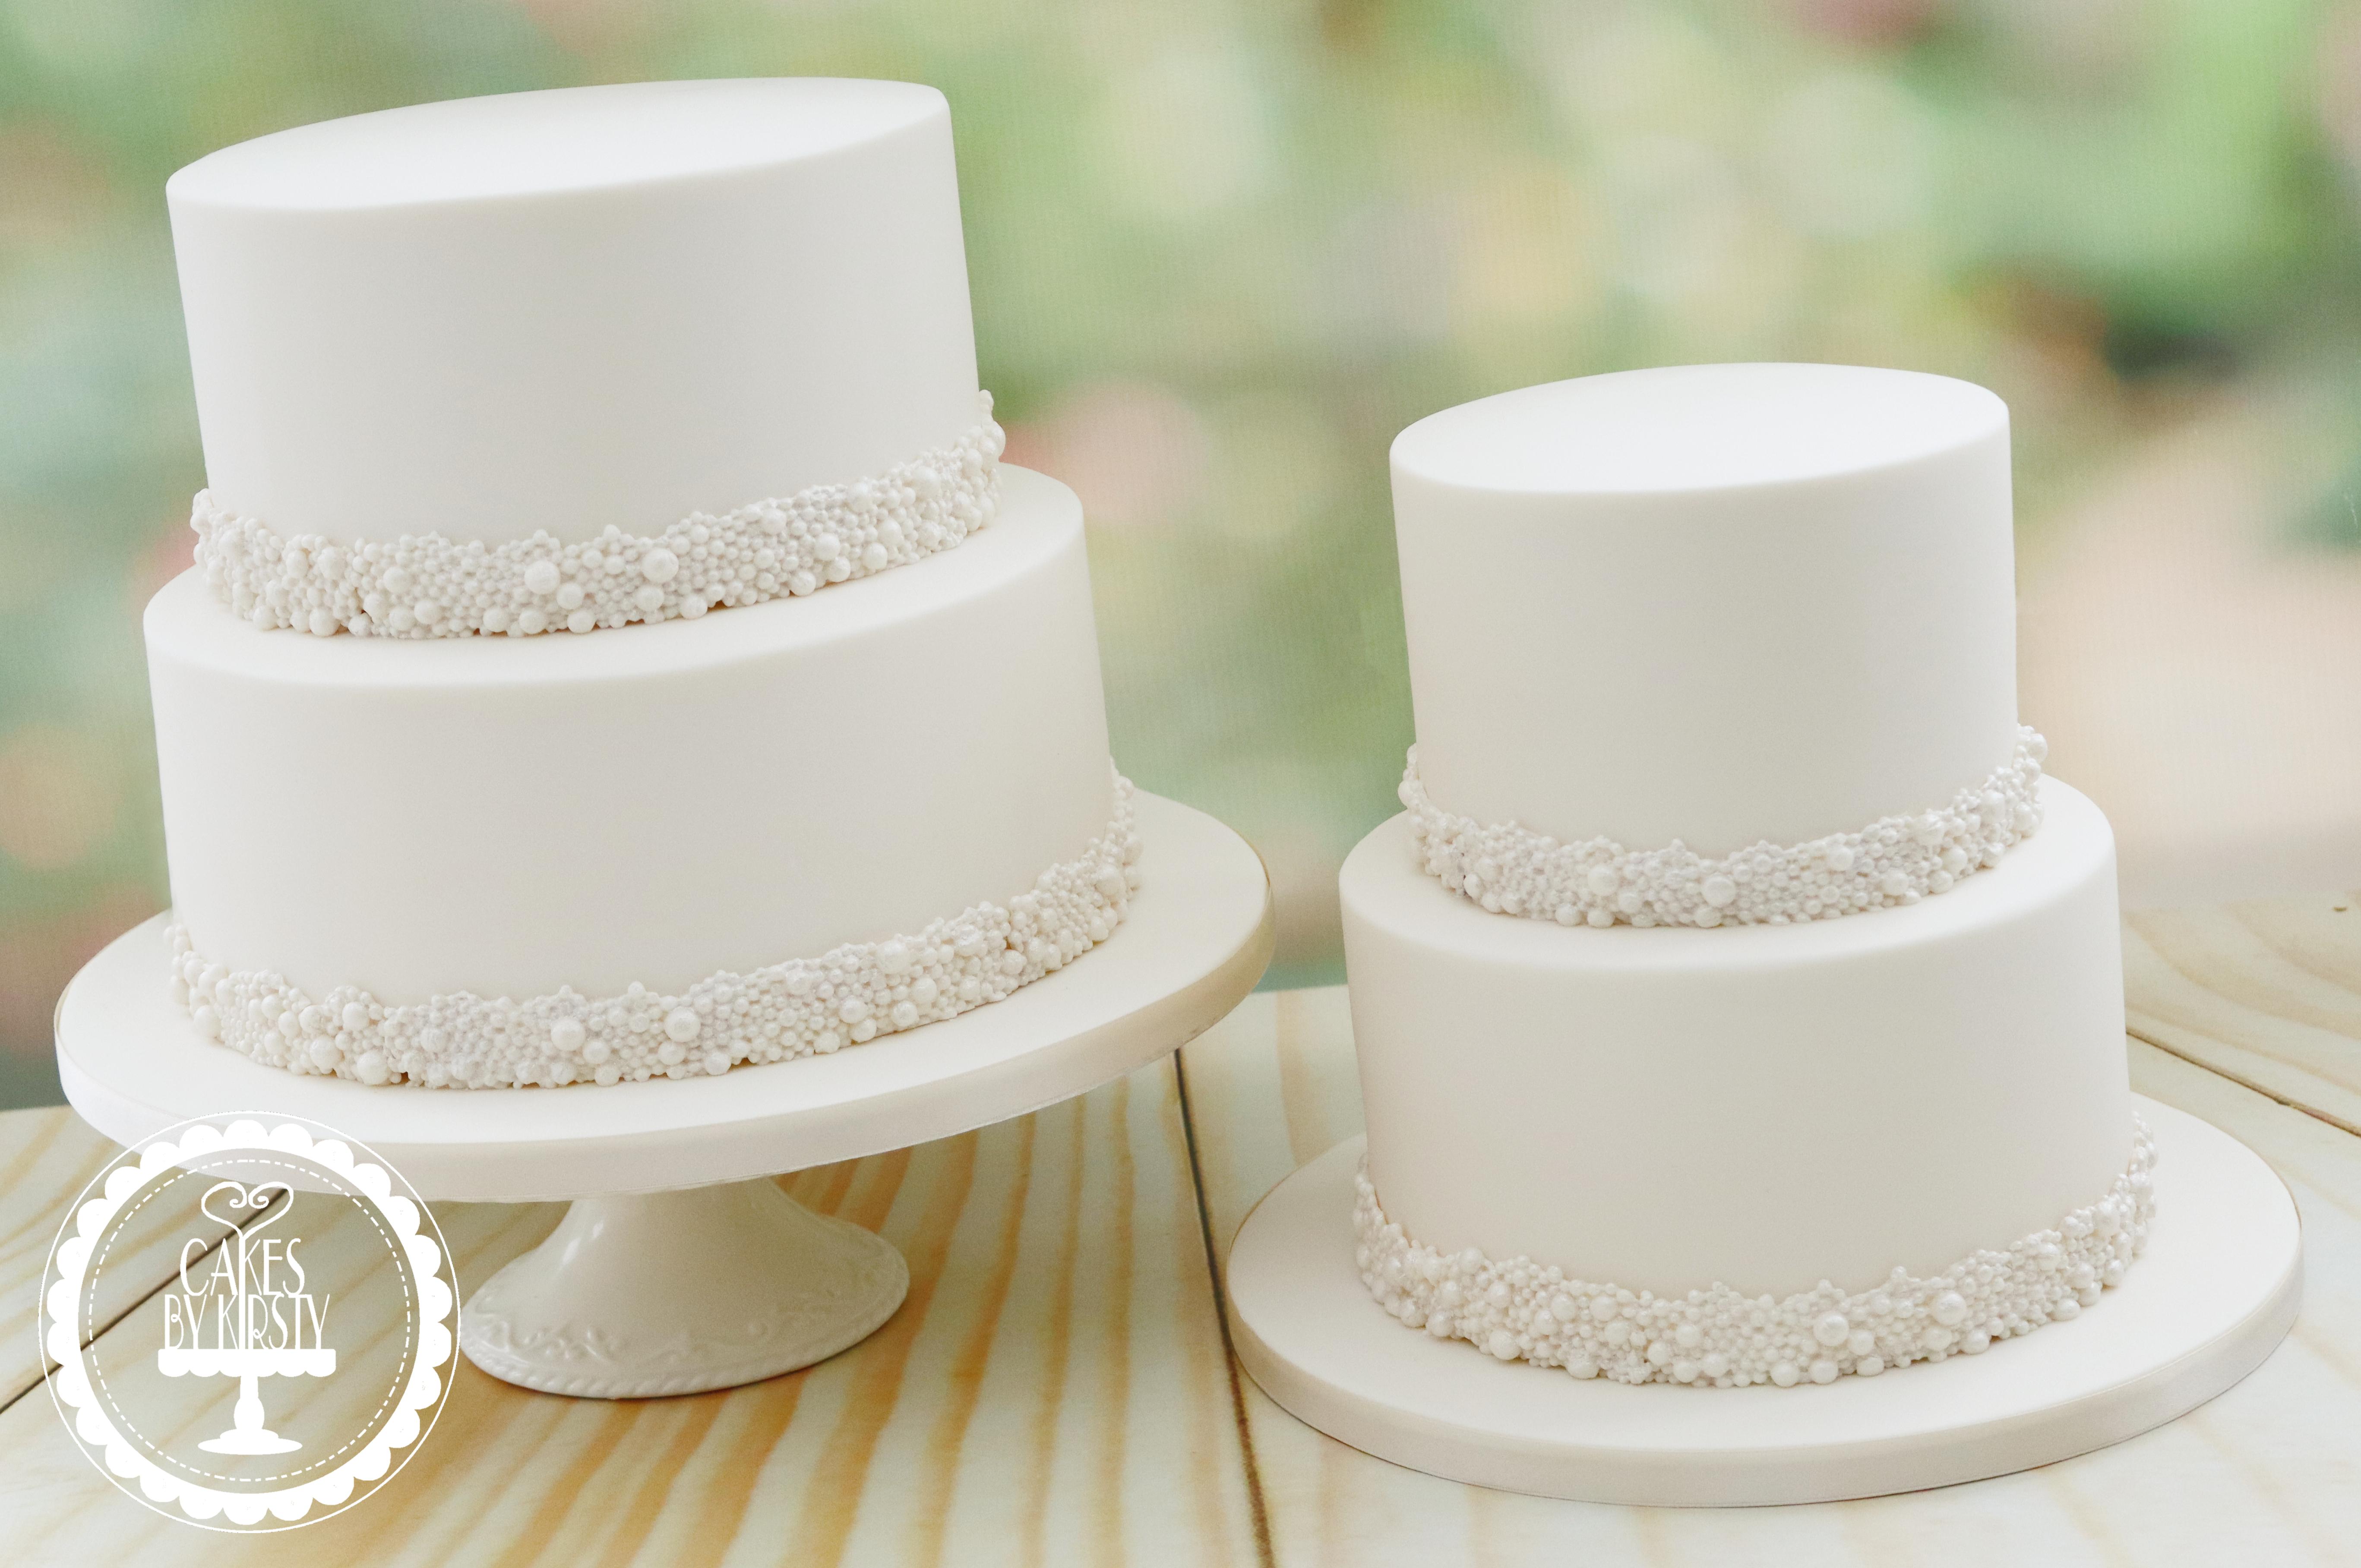 20190809 - Pearl Wedding Cakes